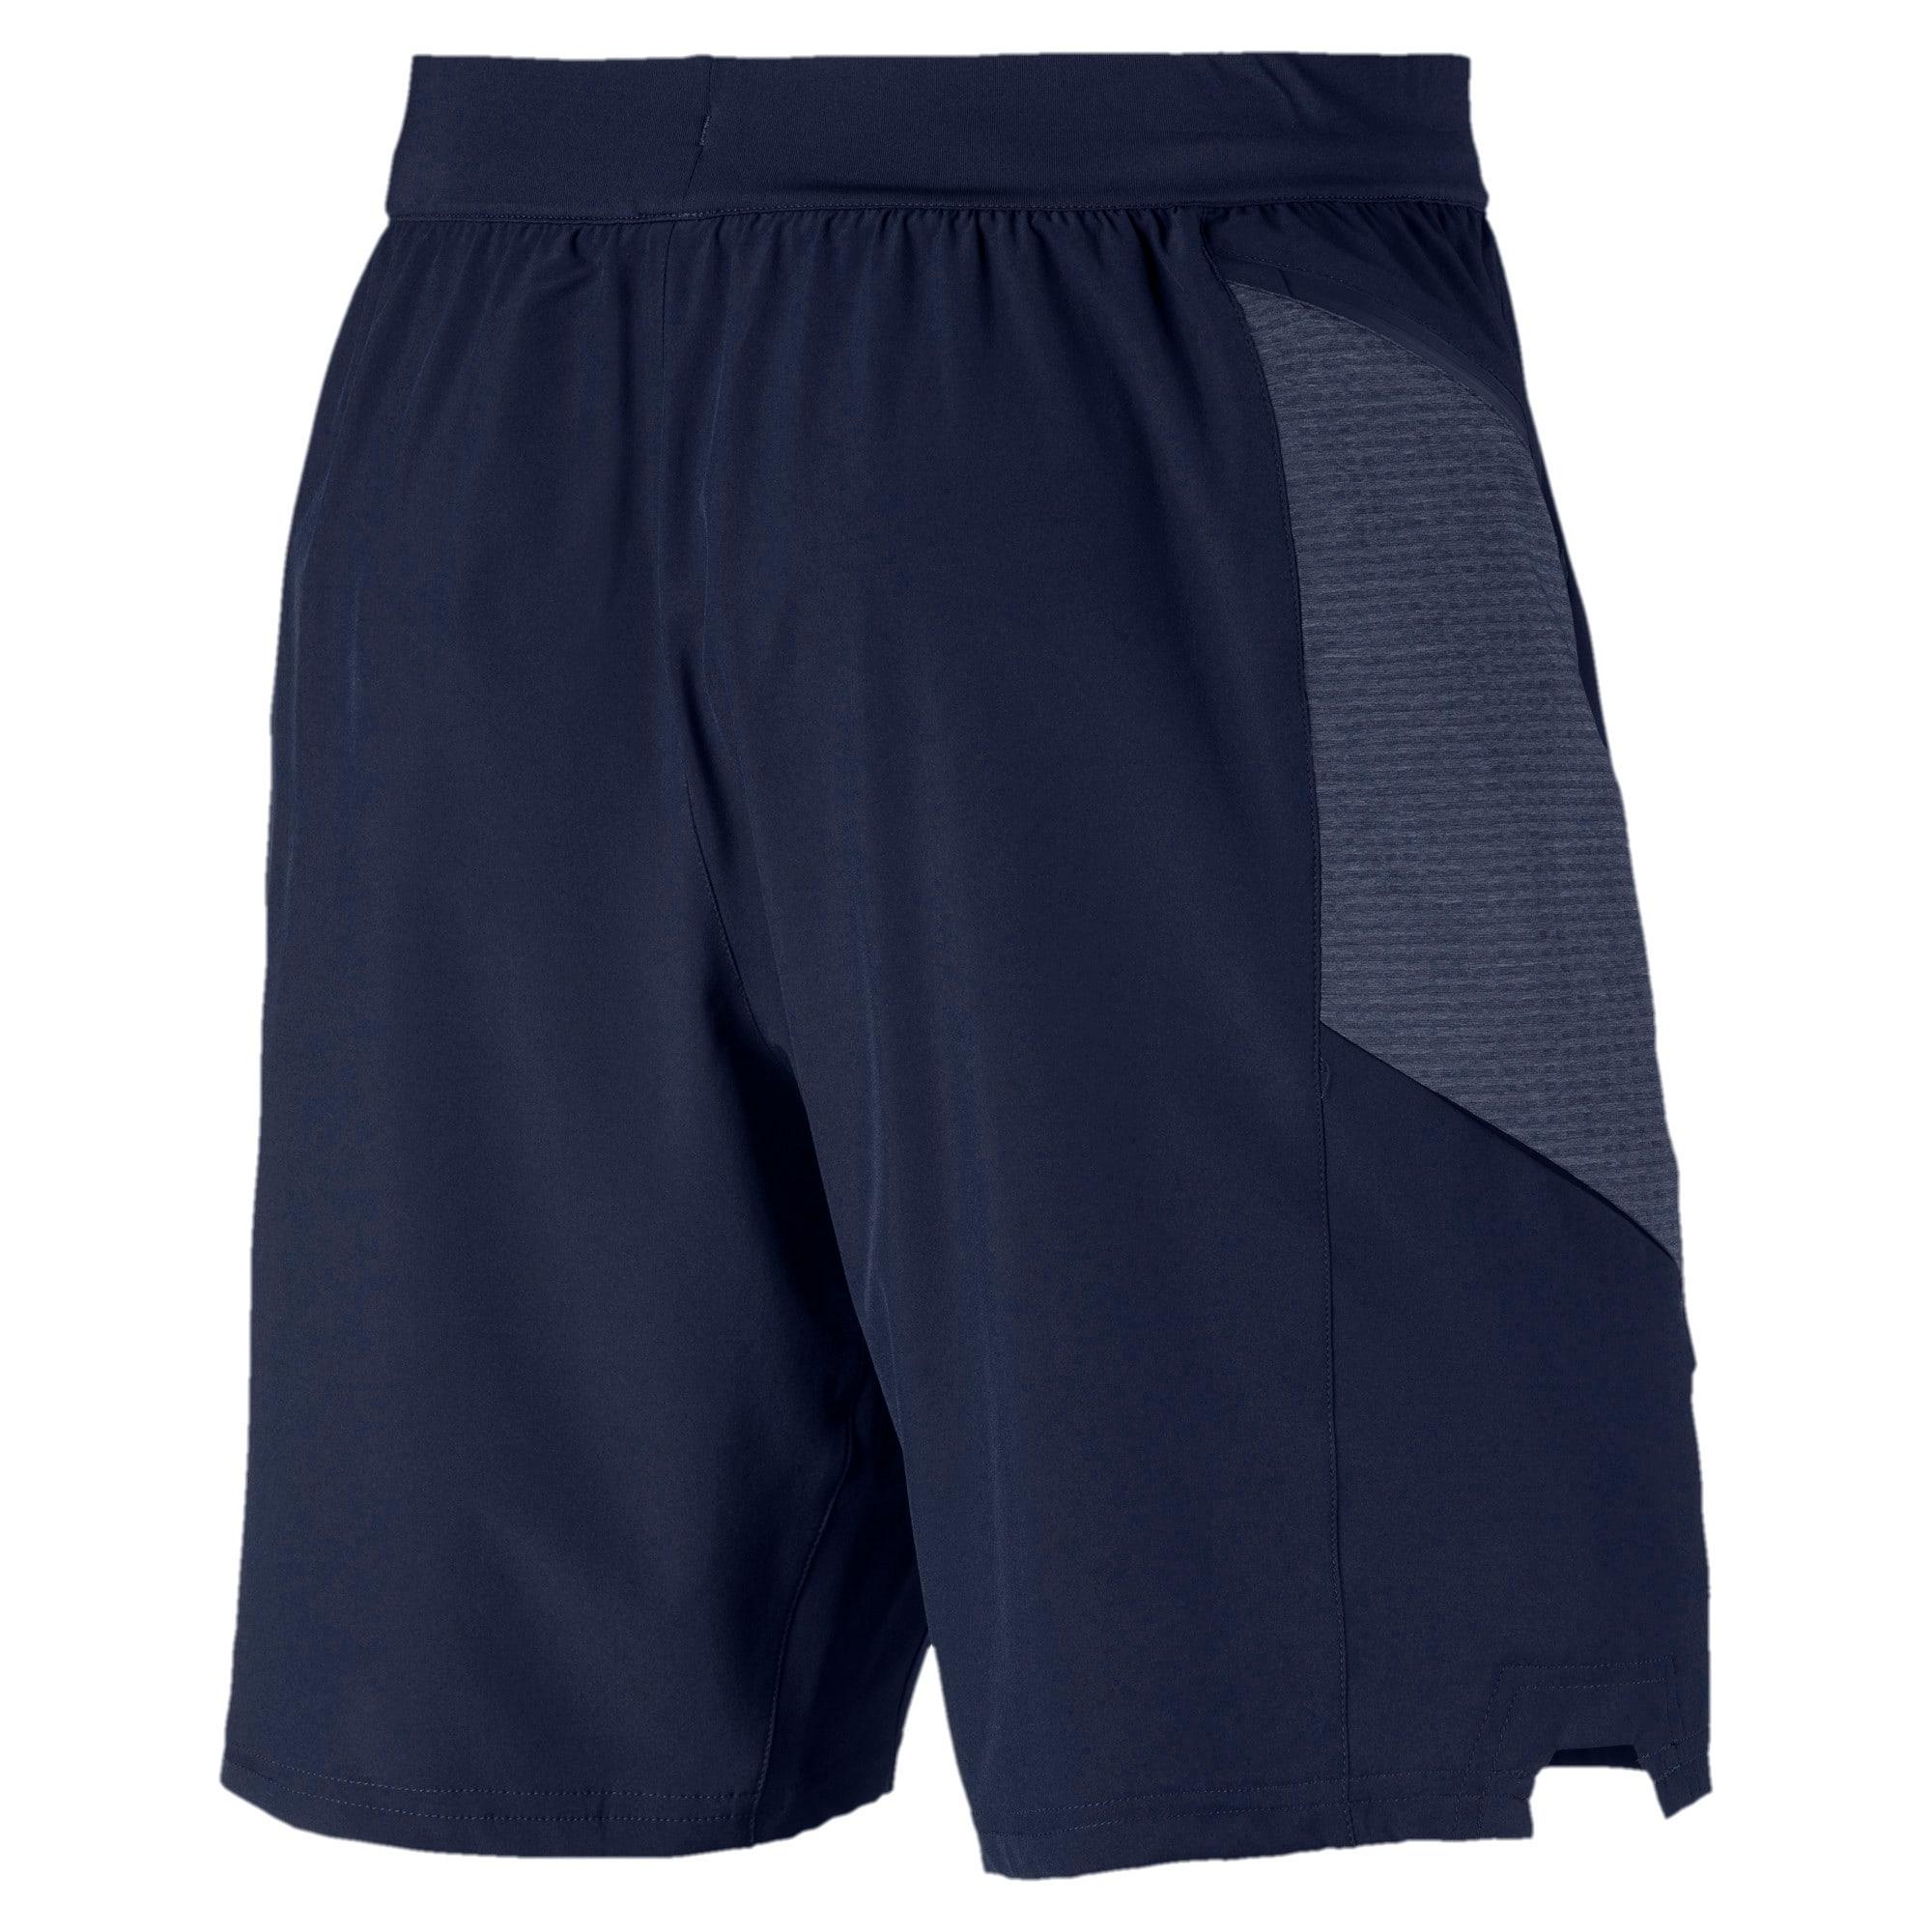 Thumbnail 5 of NeverRunBack 9'' Men's Training Shorts, Peacoat, medium-IND